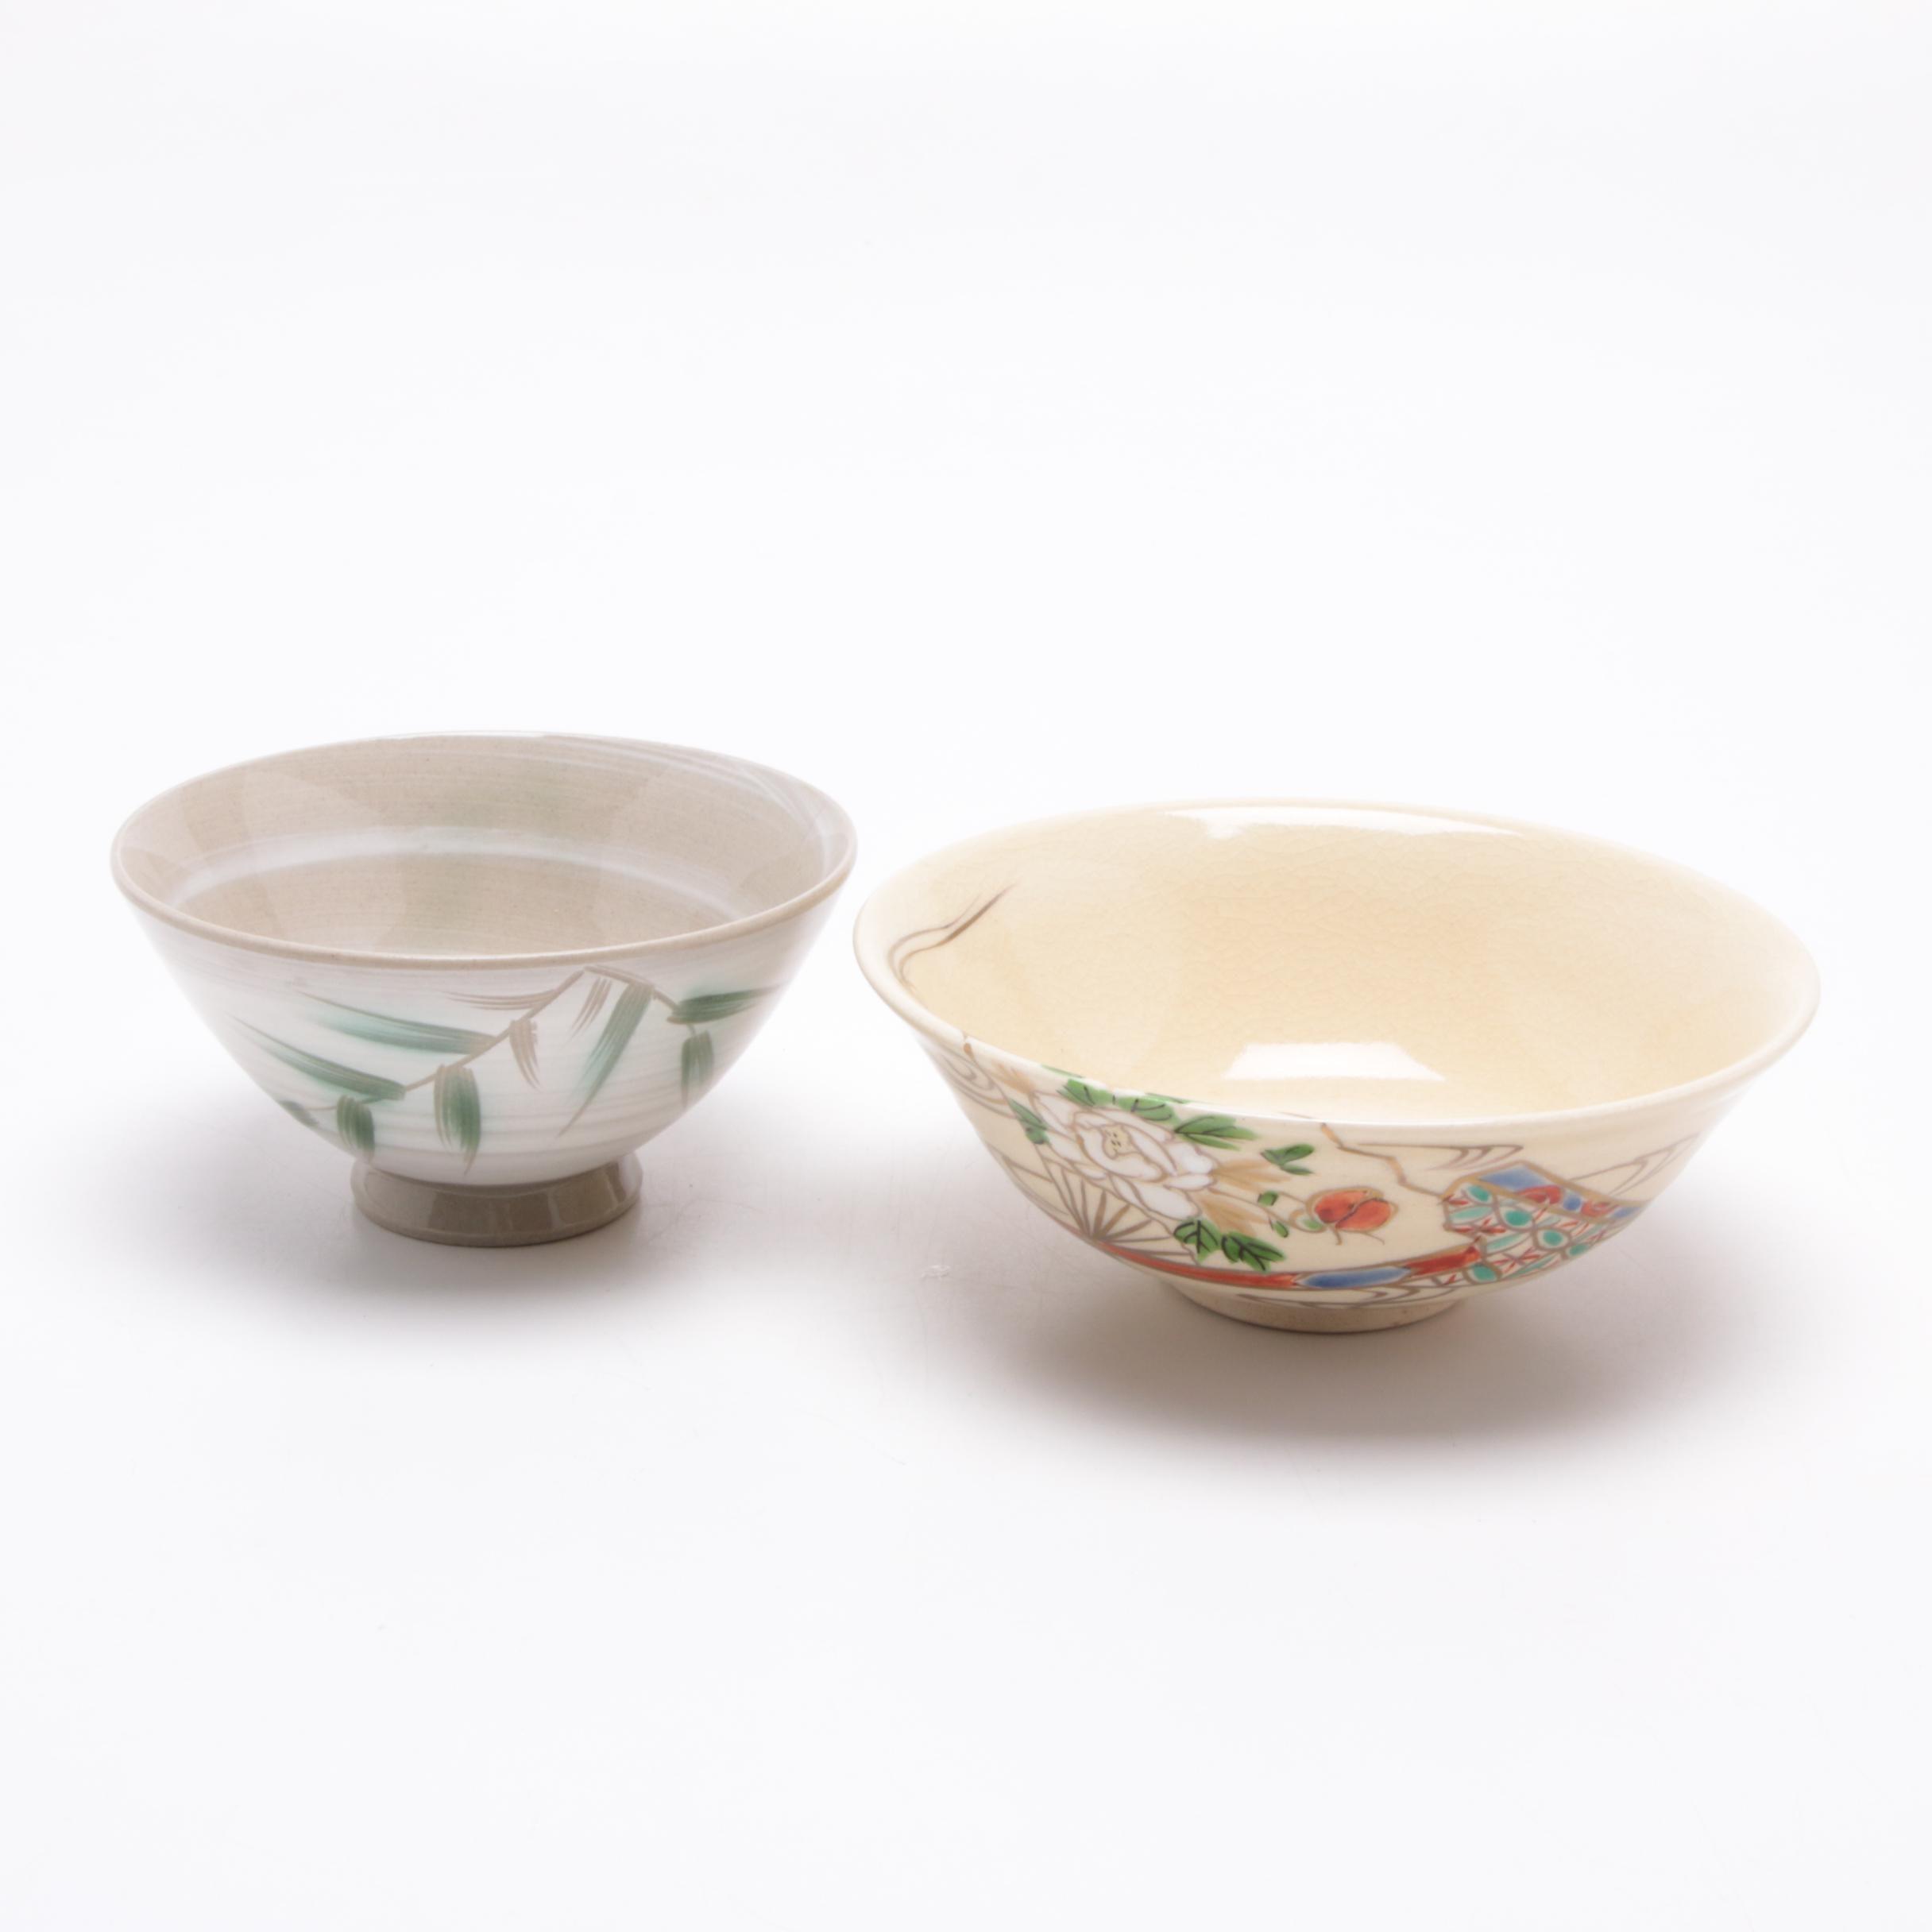 Japanese Otagiri and Studio Art Pottery Bowls